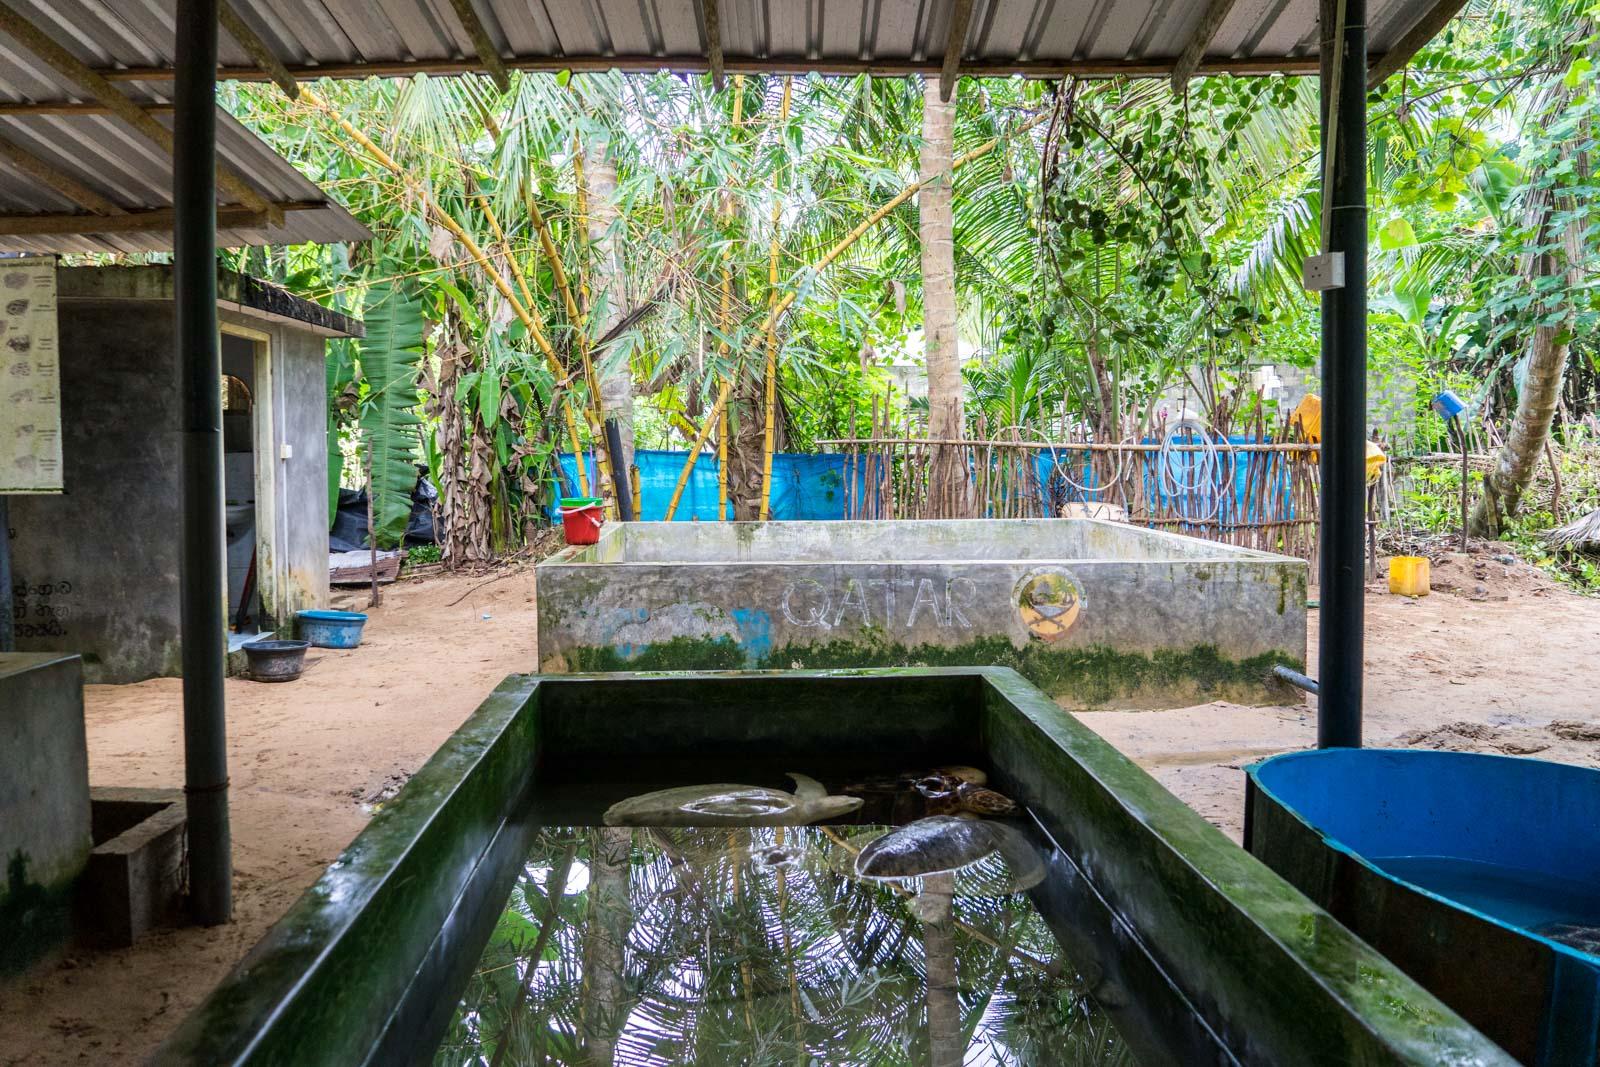 Kosgoda Turtle Hatchery, Galle, Sri Lanka